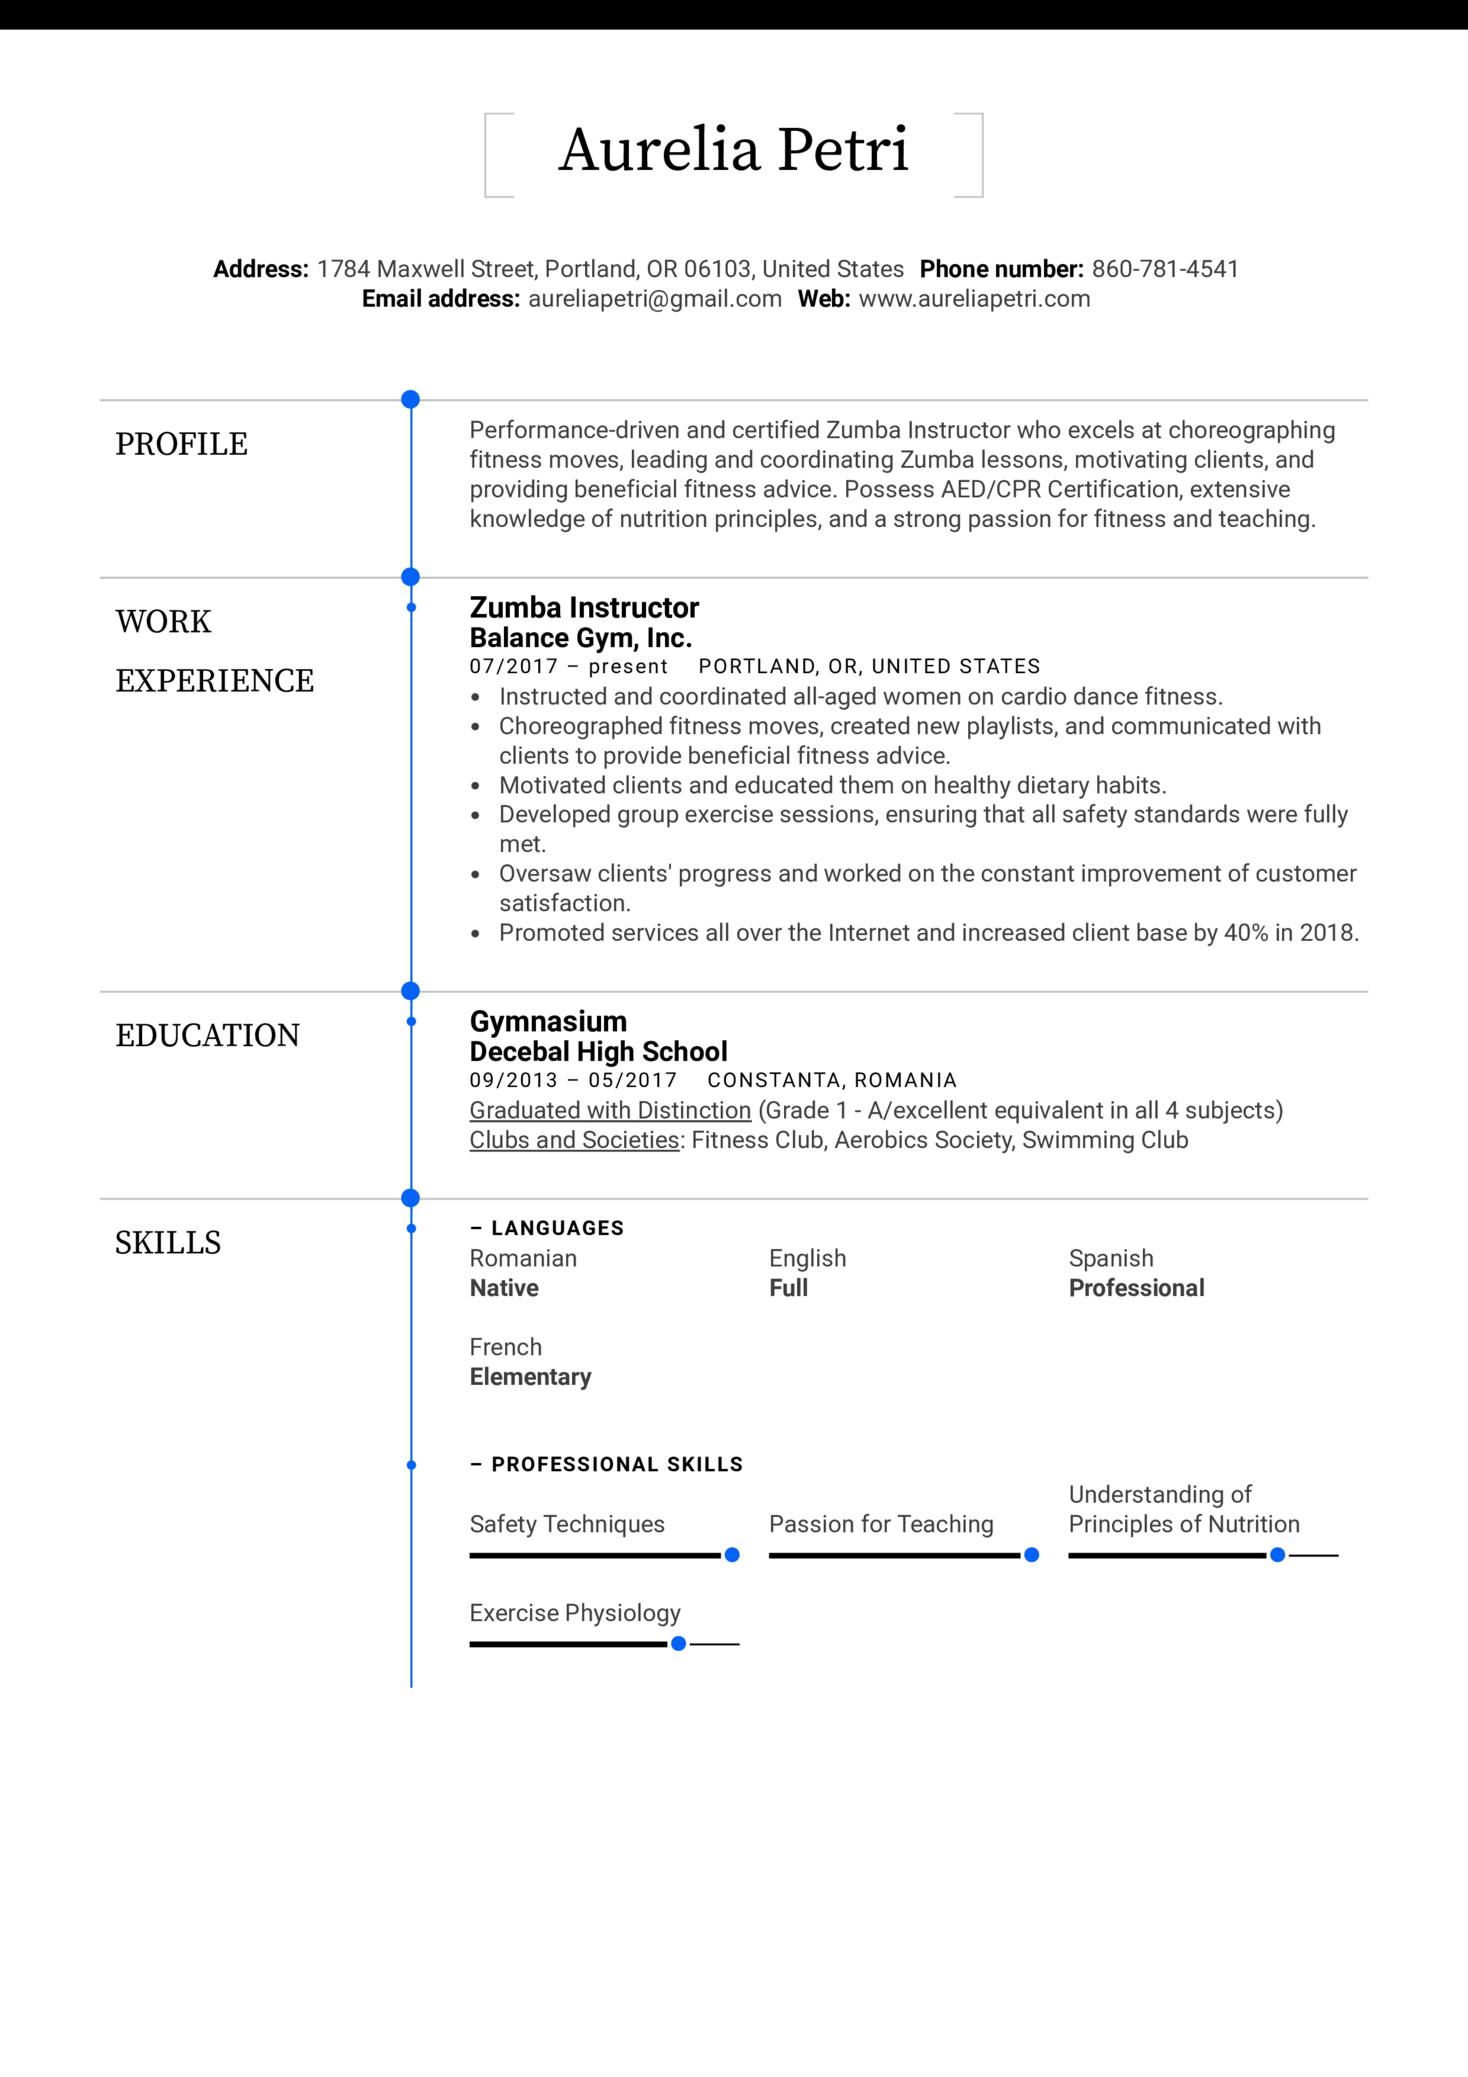 Zumba Instructor Resume Example (parte 1)